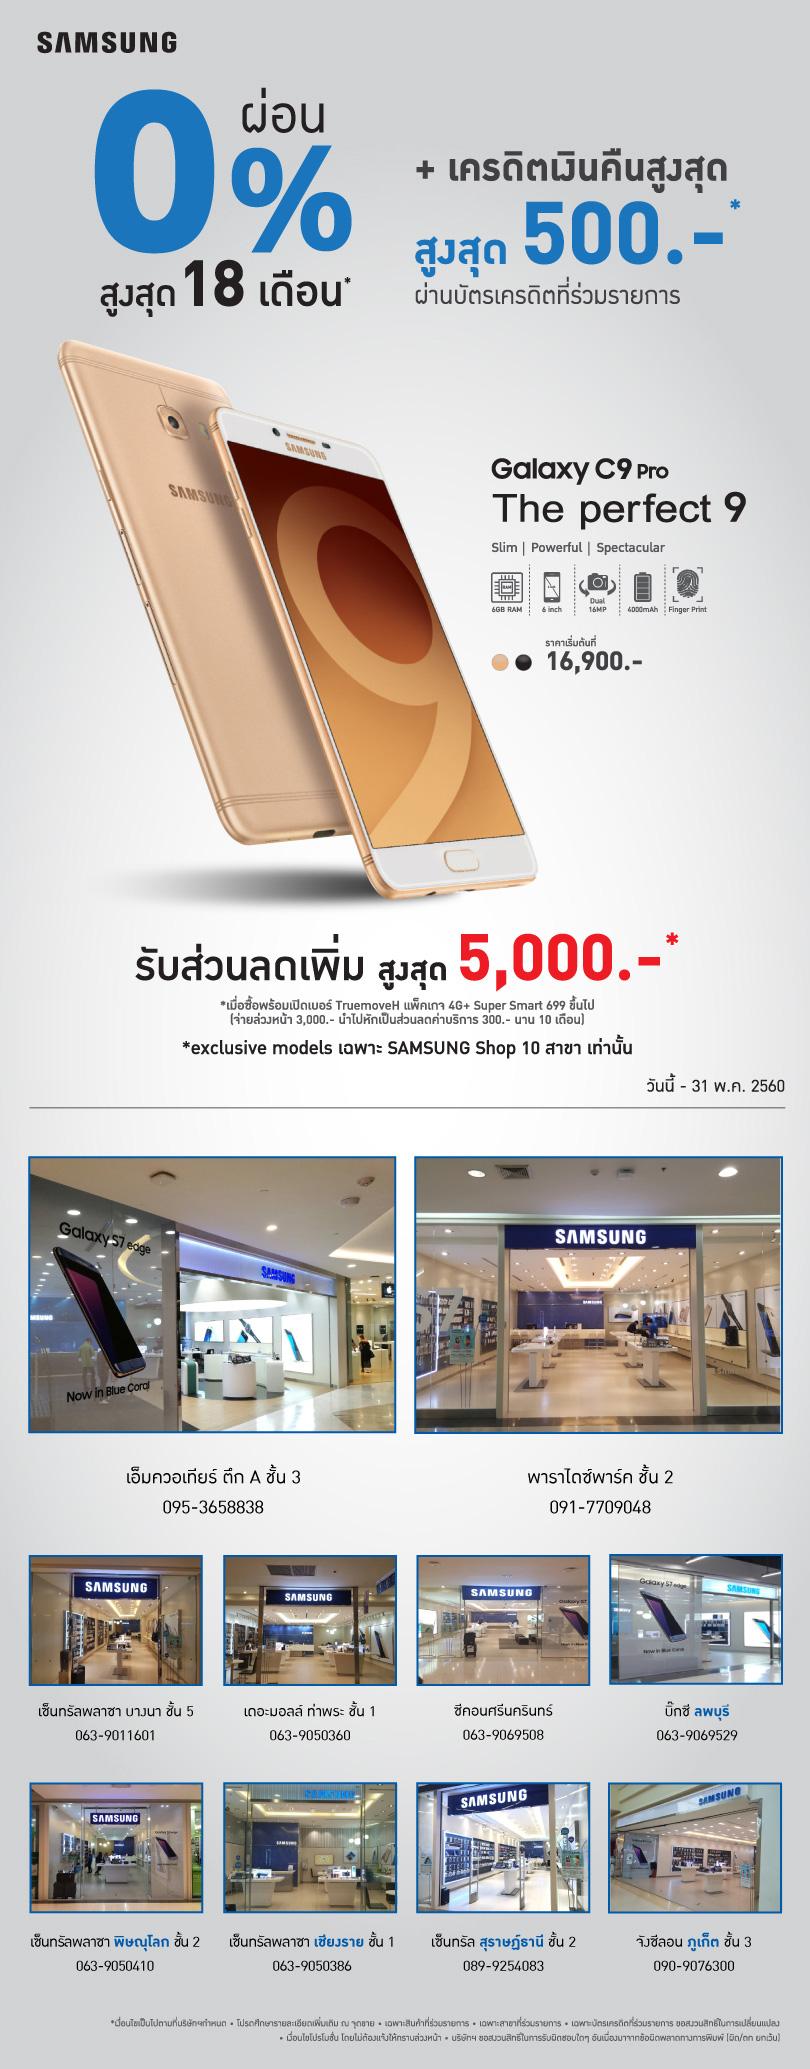 Samsung-Galaxy-C9-Pro-due31may17